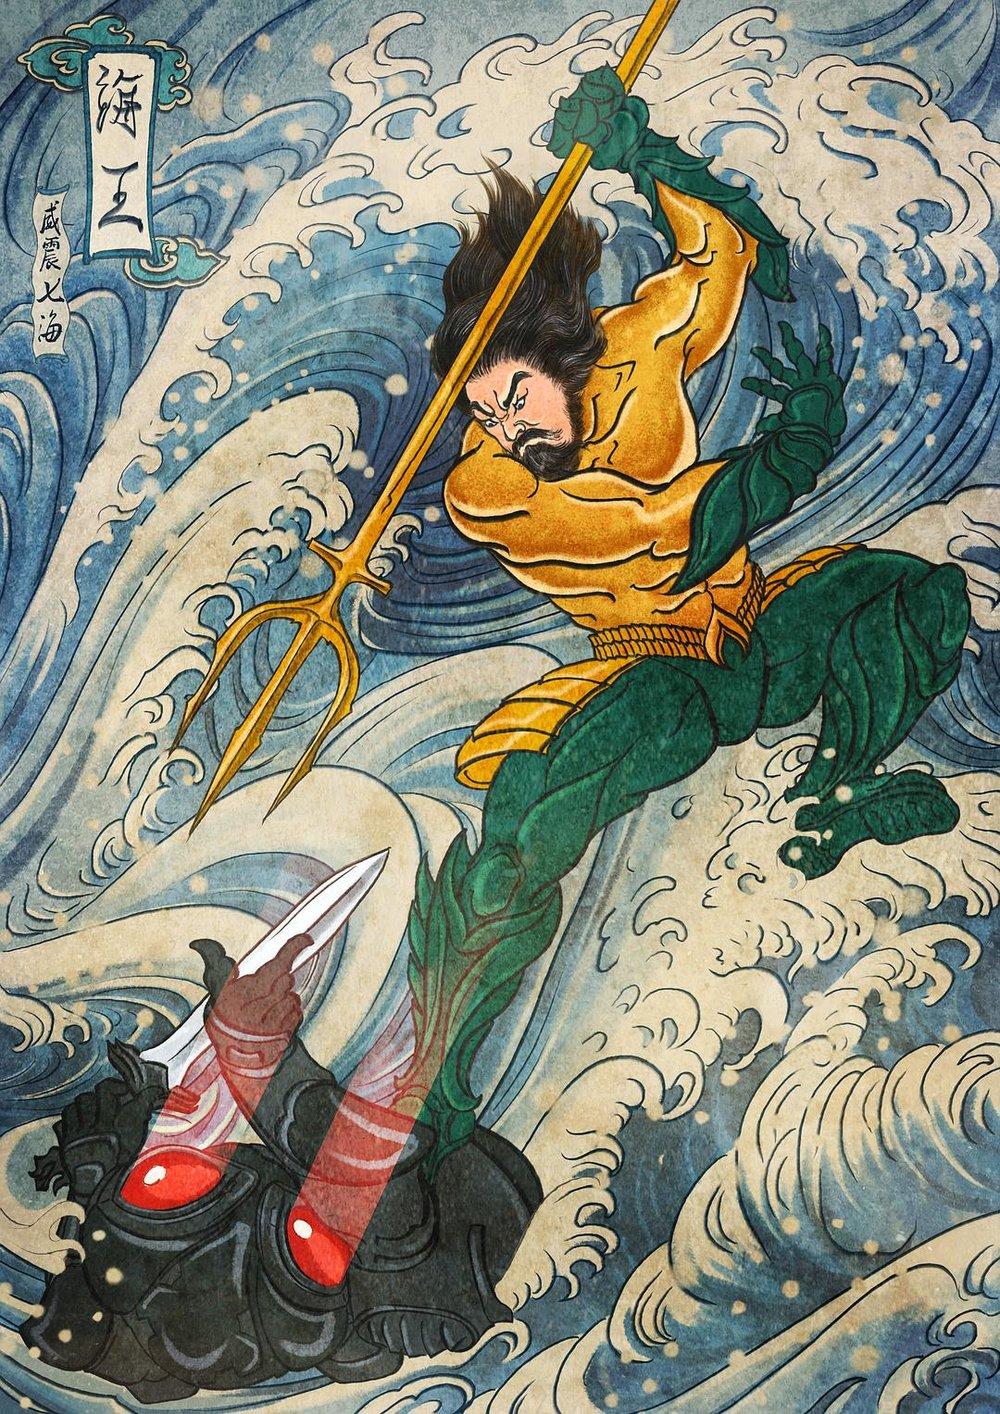 Ah, già, il poster cinese.